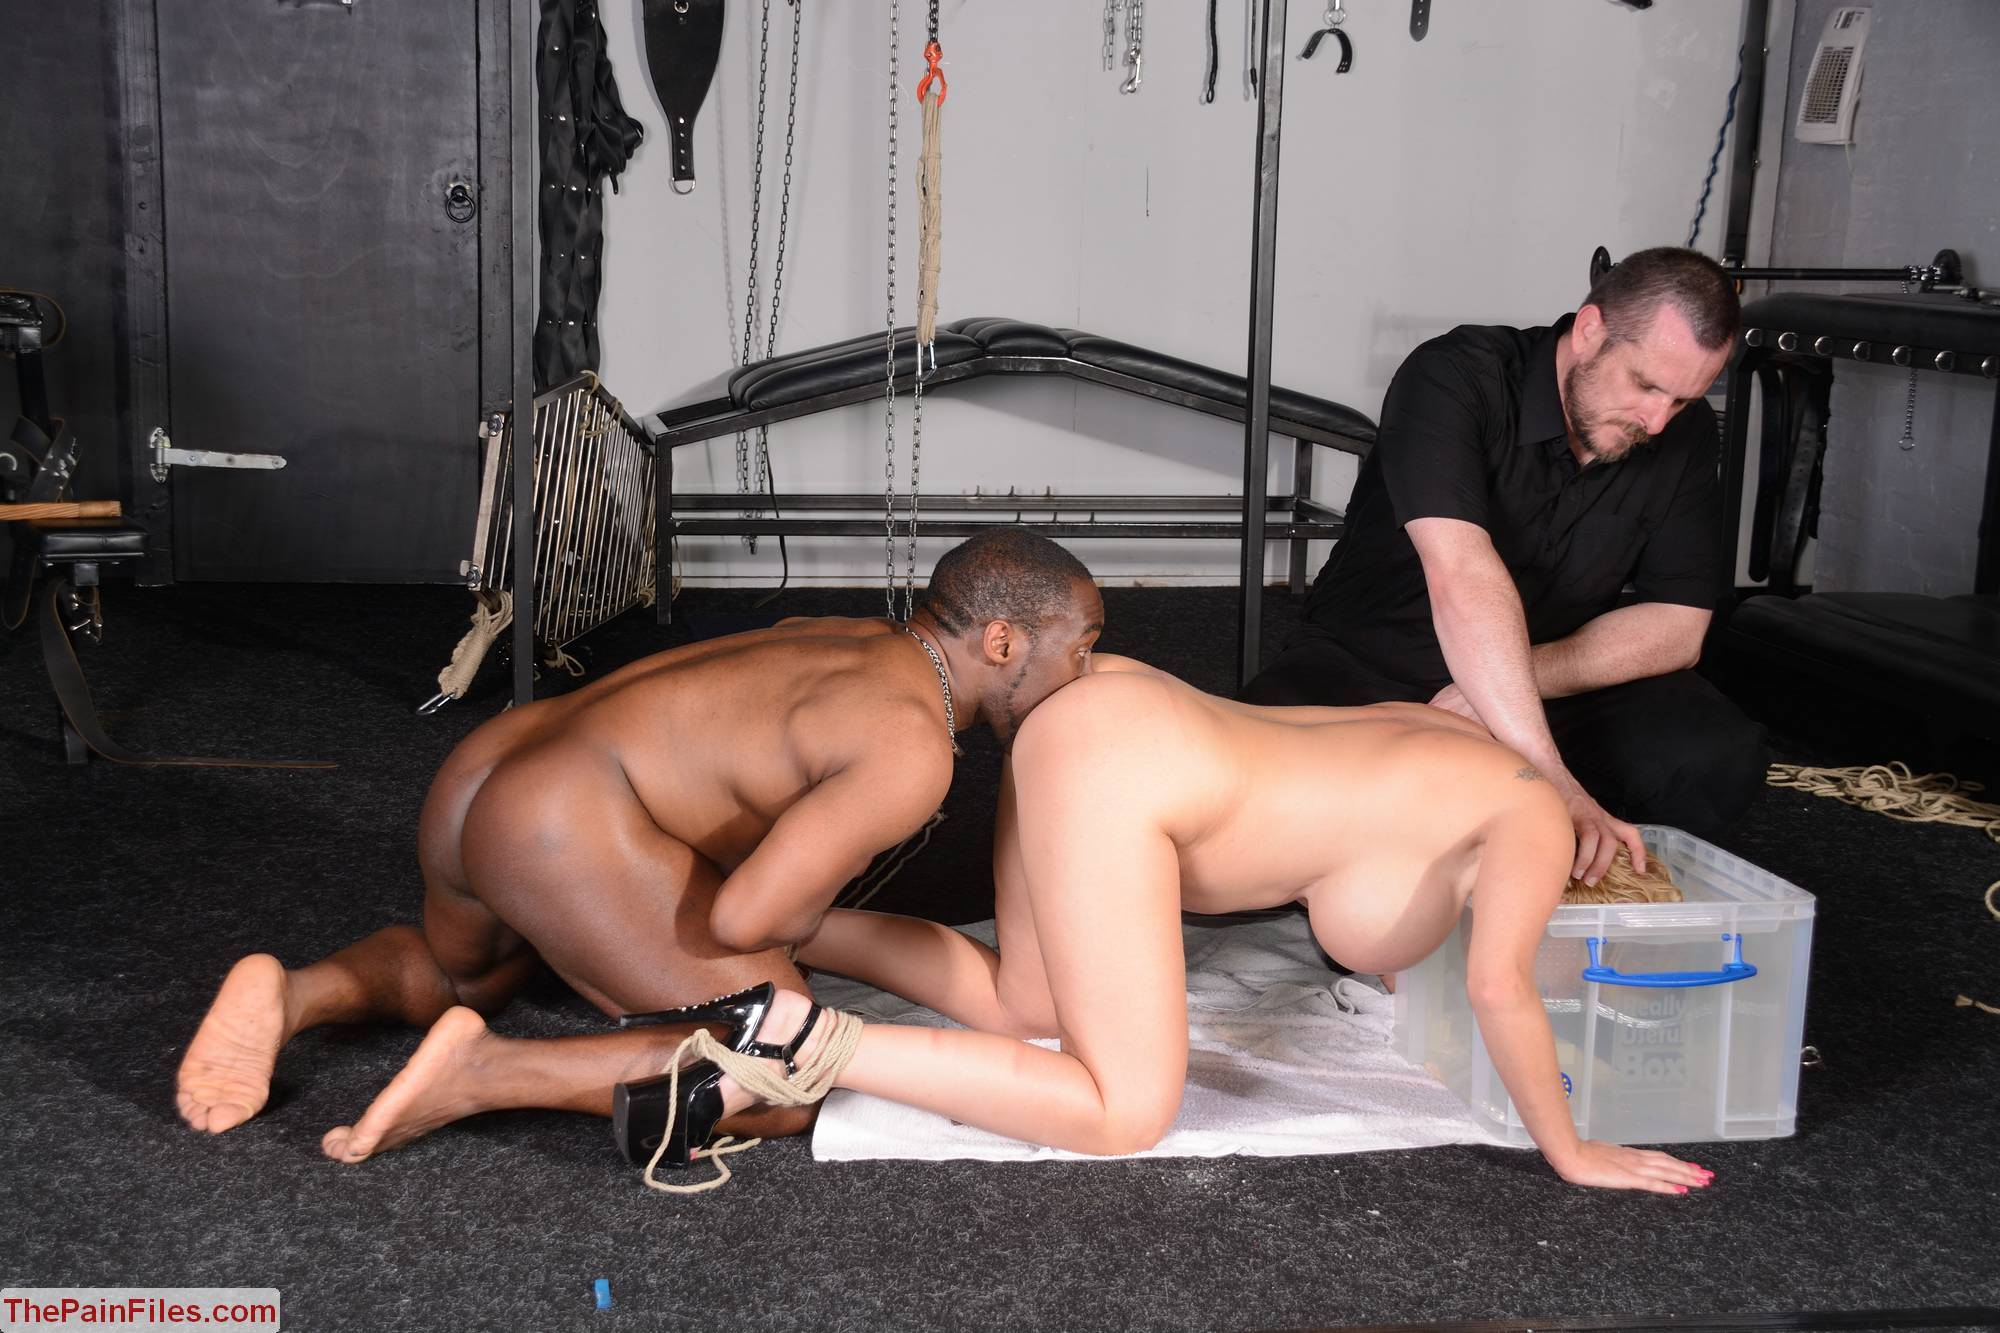 Kinky Melanie Moon in Interracial BDSM. German slavesex of busty Melanie Moons extreme fetisch